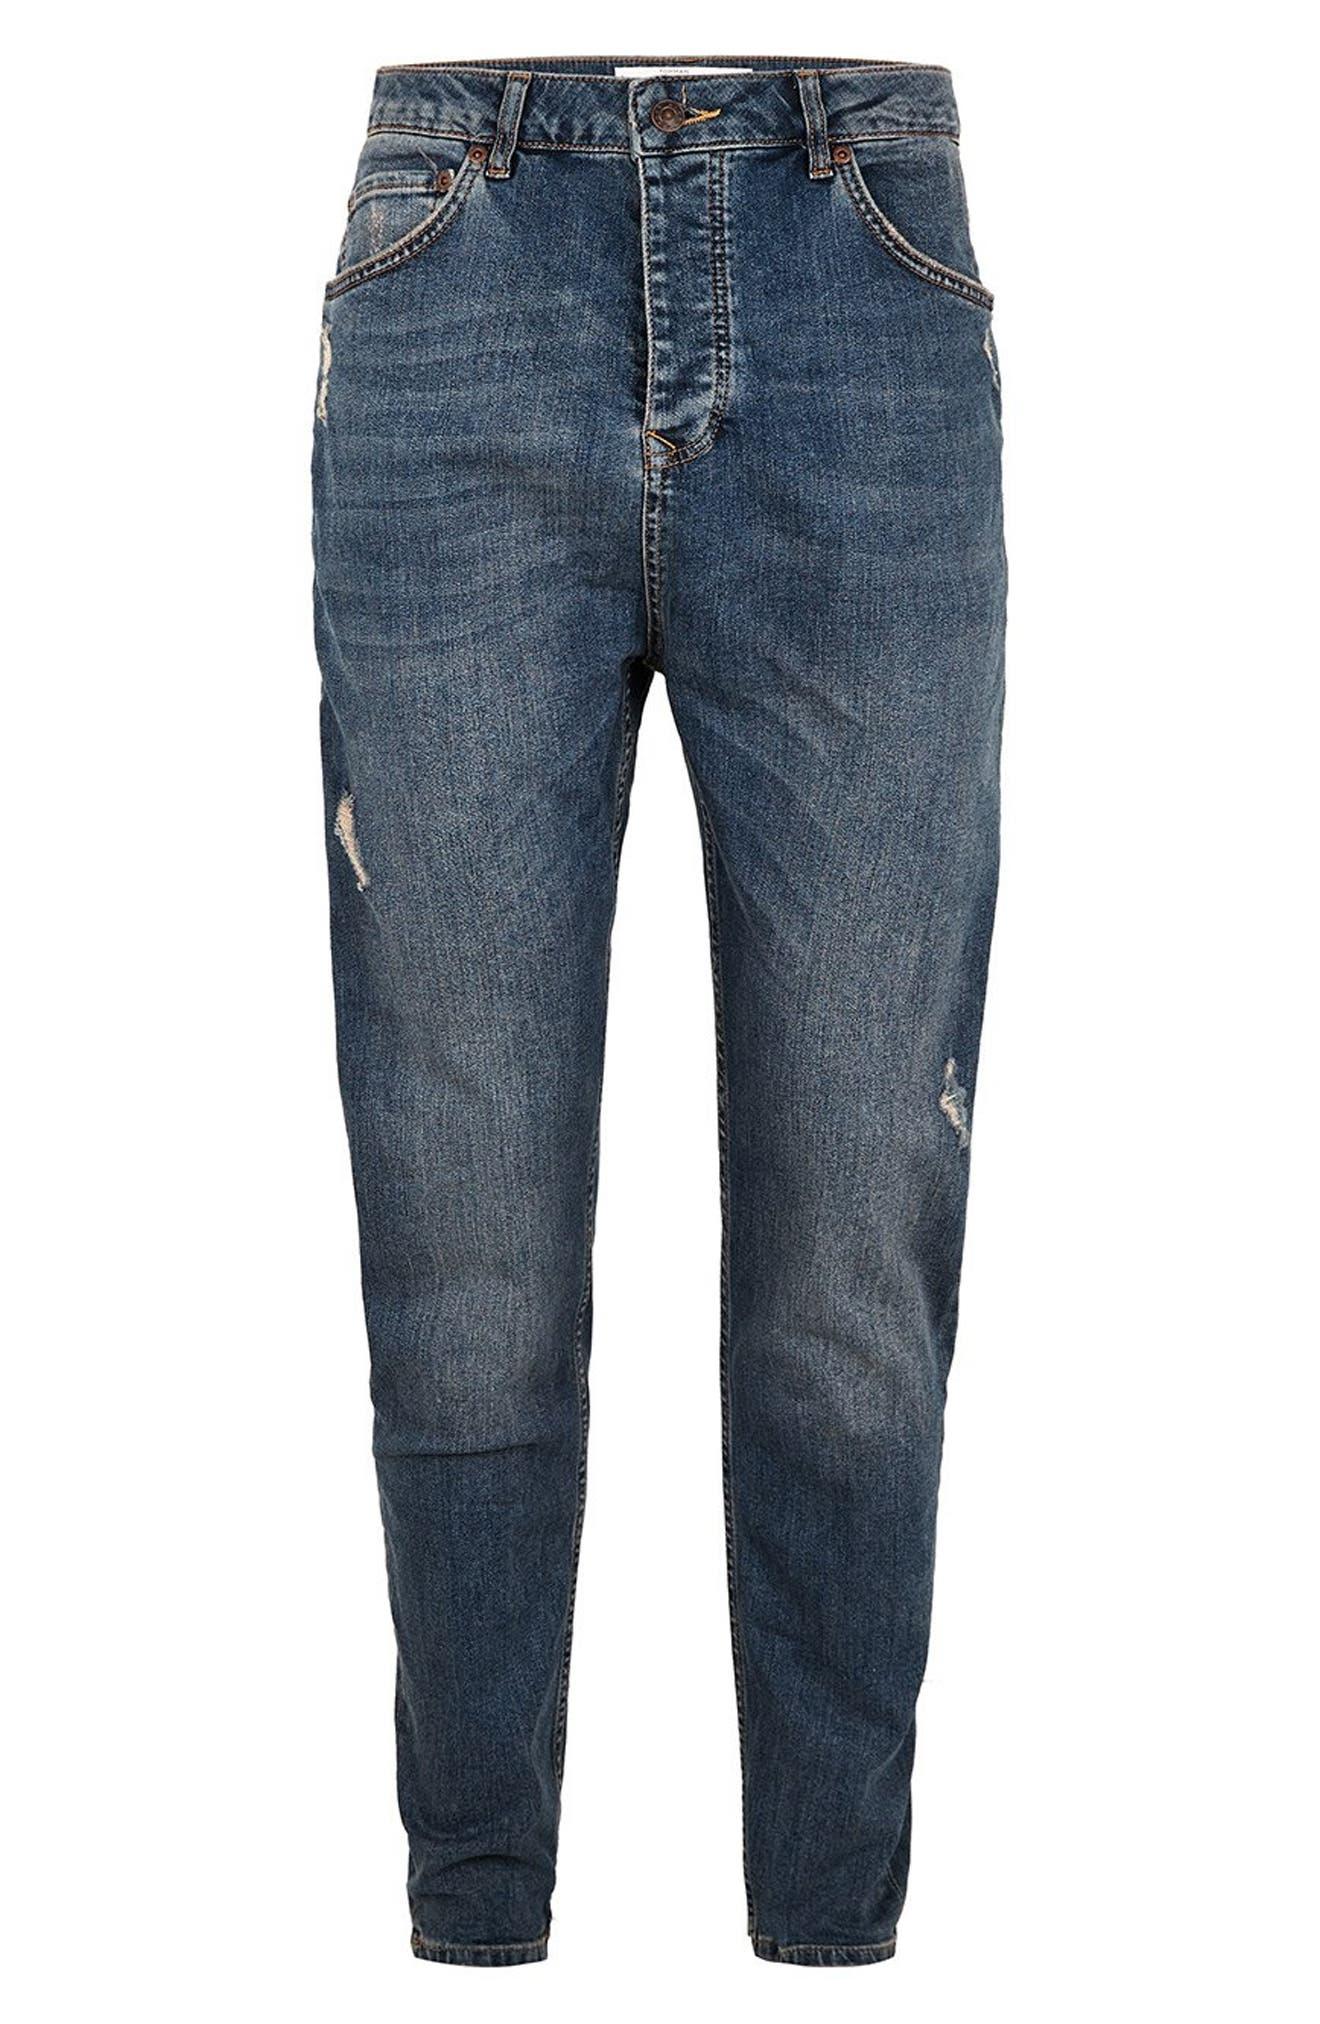 Taper Jeans,                             Alternate thumbnail 5, color,                             BLUE